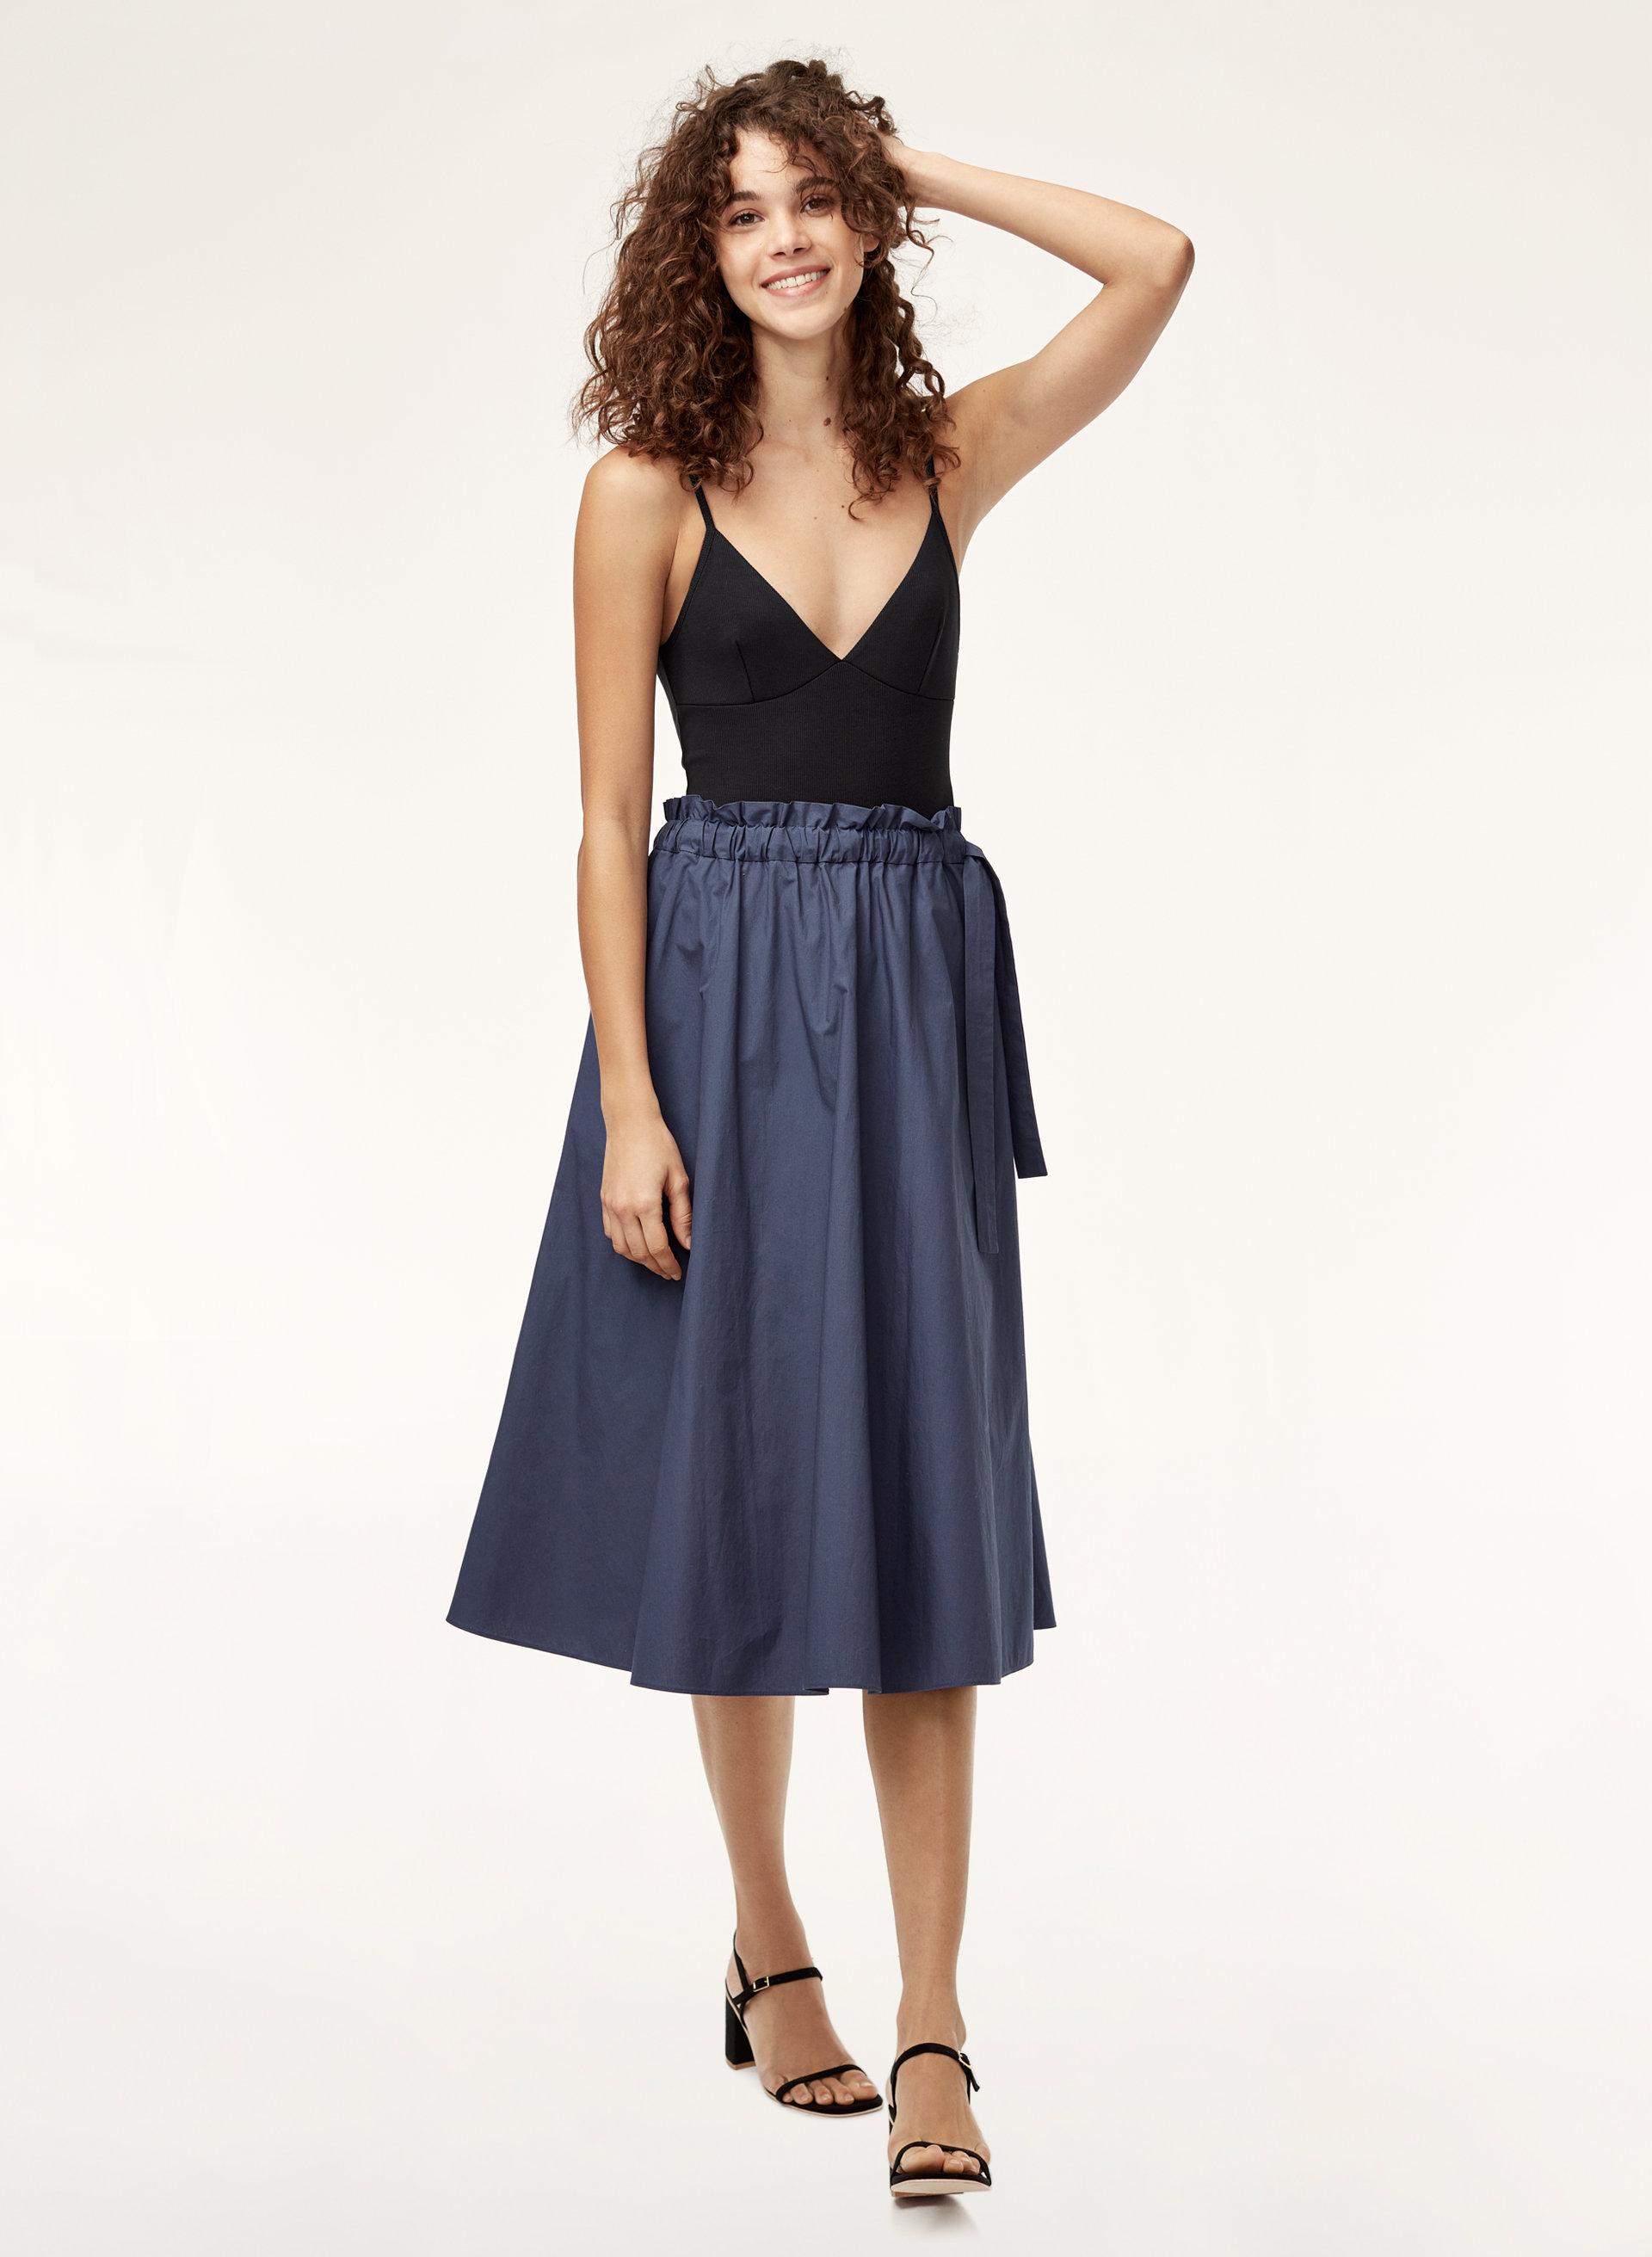 74206d00e9 RACHELLE BODYSUIT. Styled with chambly skirt ...